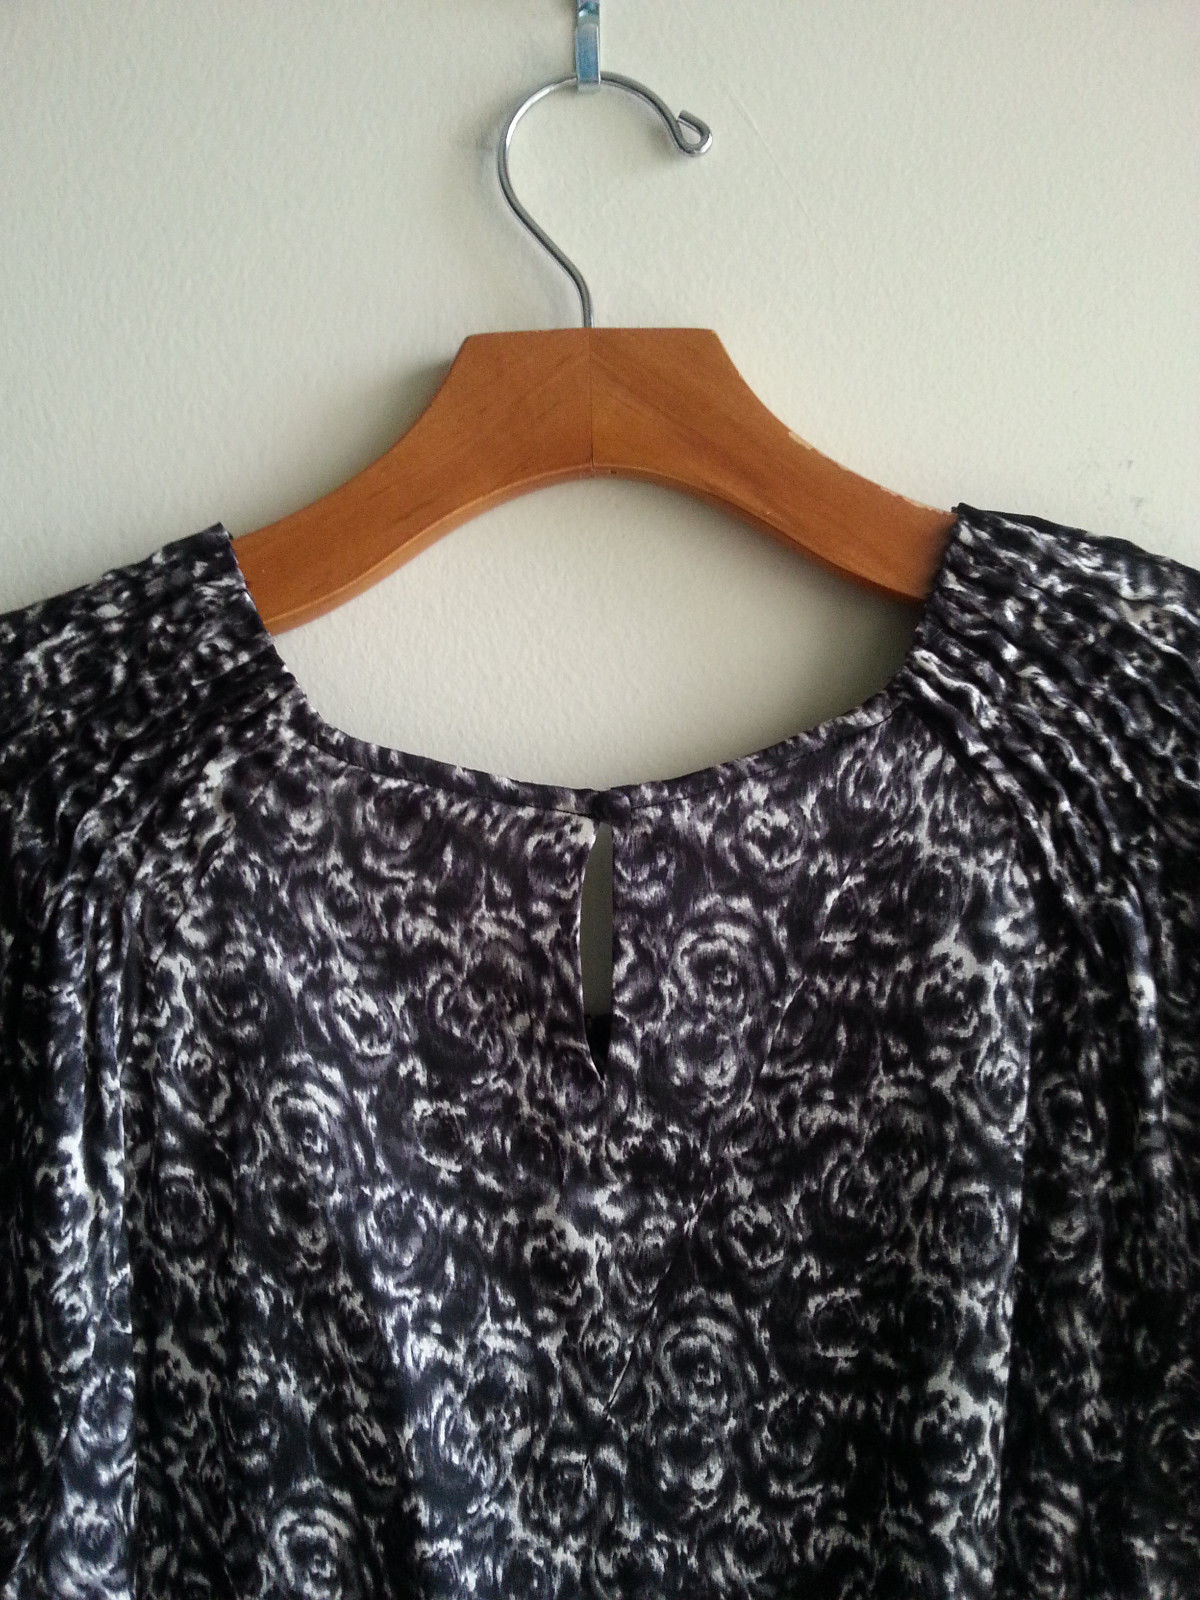 3212a0b023758a Banana Republic Silk Top Blouse Black White and 50 similar items